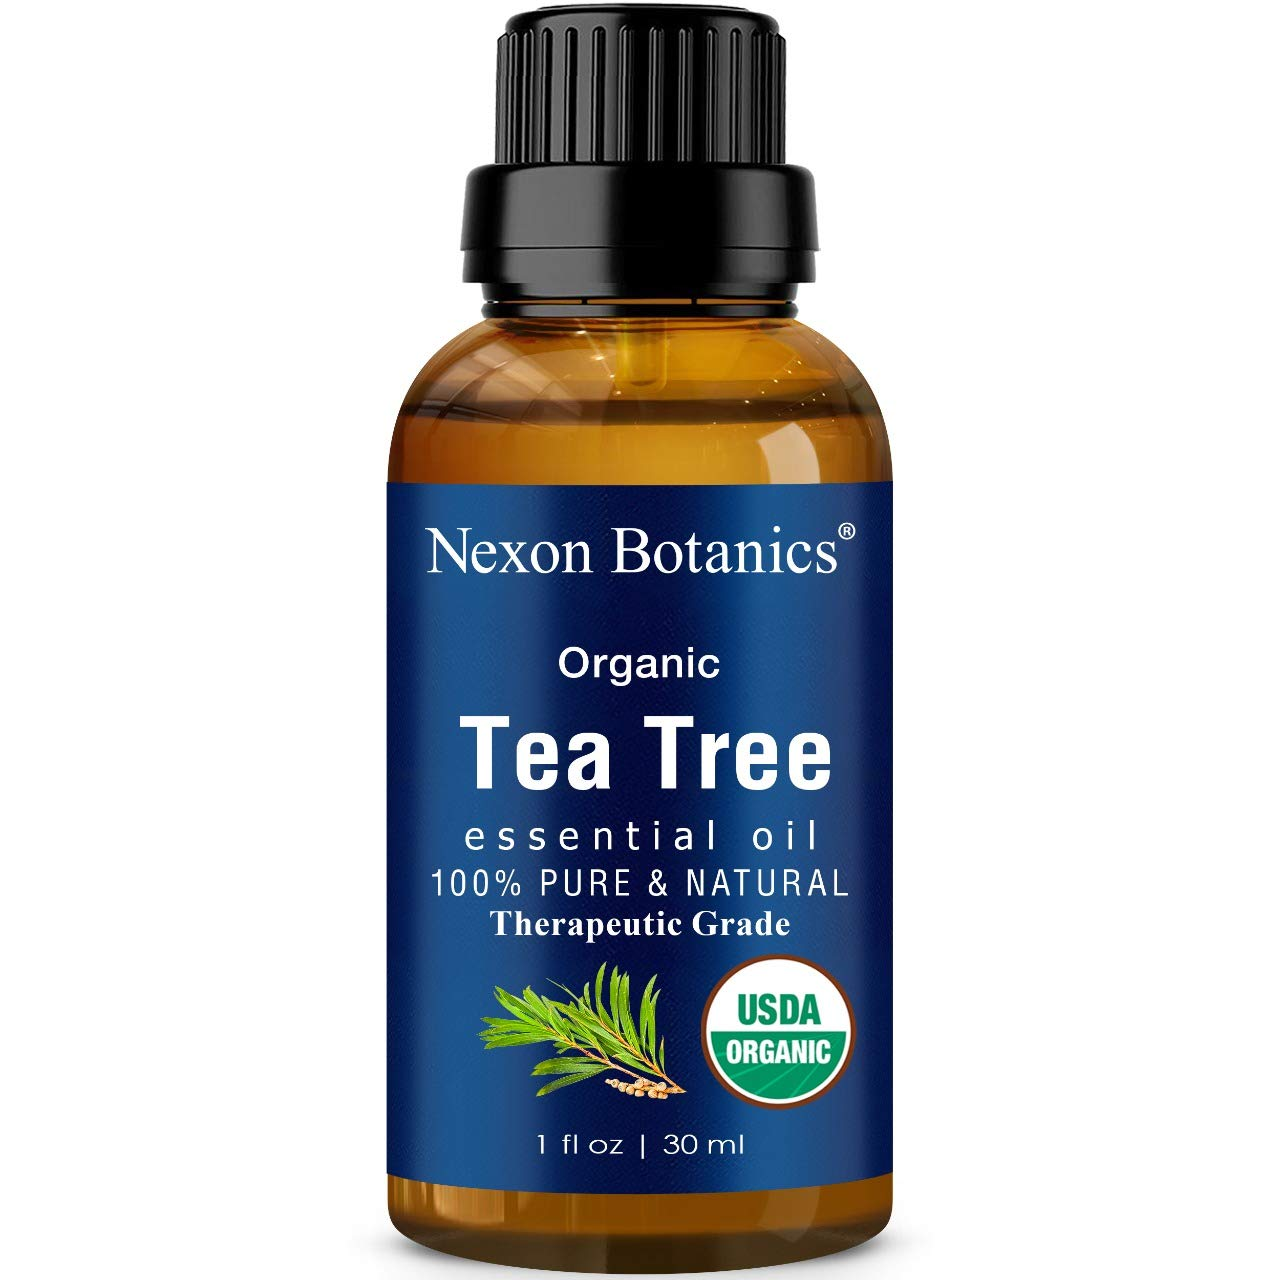 Organic Tea Tree Essential Oil 30 ml - Certified USDA, Pure, Natural Undiluted Therapeutic Grade Tea Tree Oil For Hair, Face, Skin, Acne and Scalp - Melaleuca Alternifolia Oils Nexon Botanics